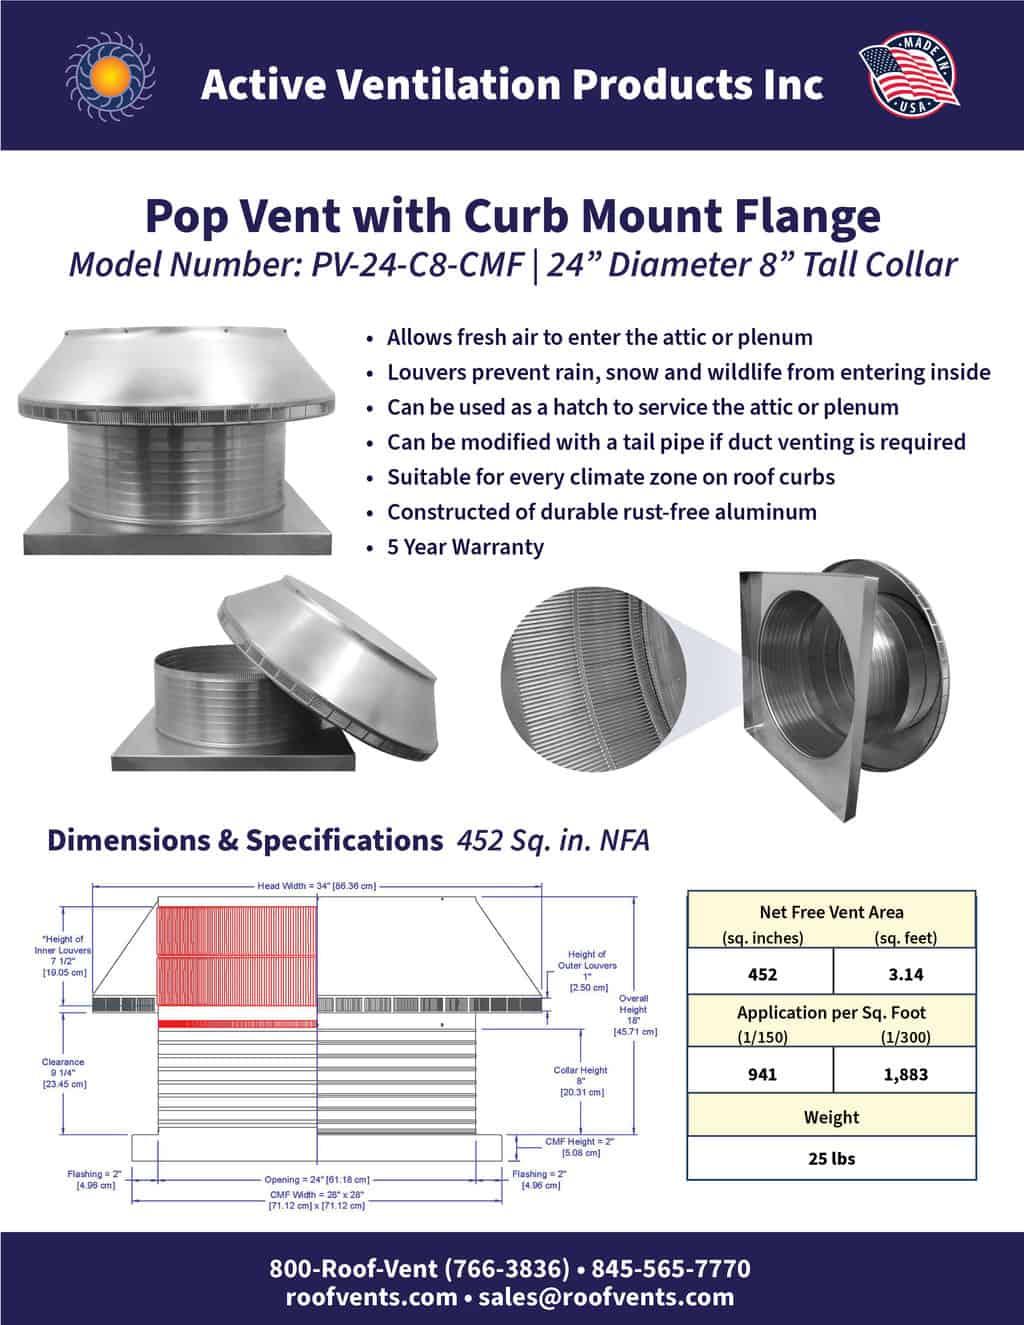 PV-24-C8-CMF-brochure